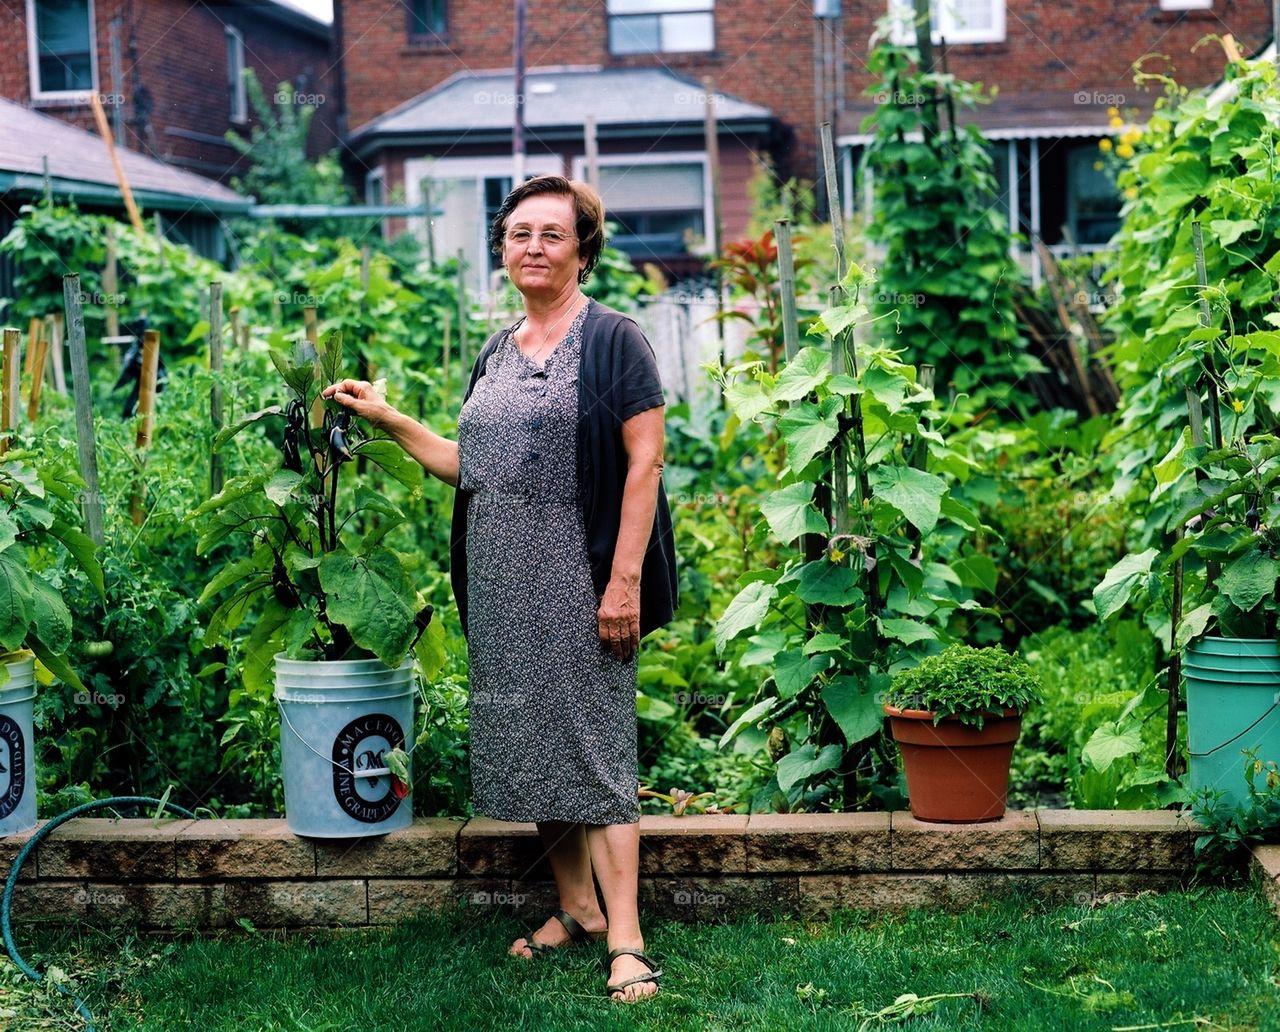 Captivating Grandmau0027s Garden. Proud Grandmother With Her Urban Organic Veg Garden